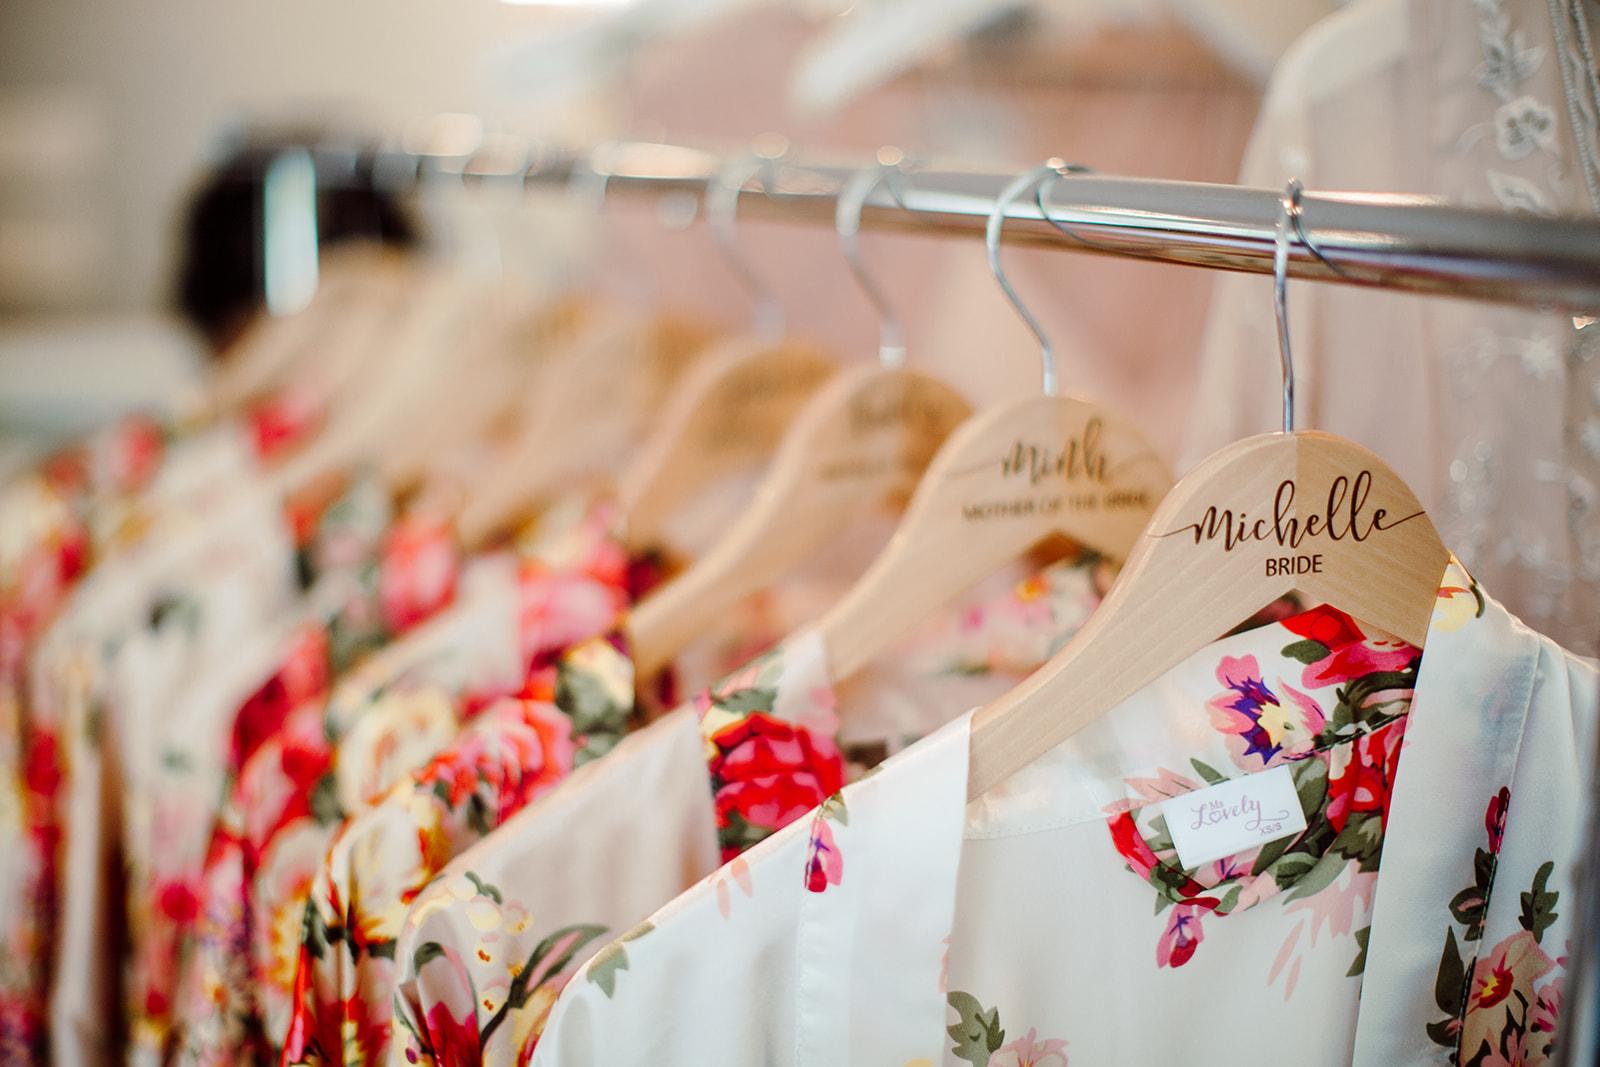 Personalized wedding hangers